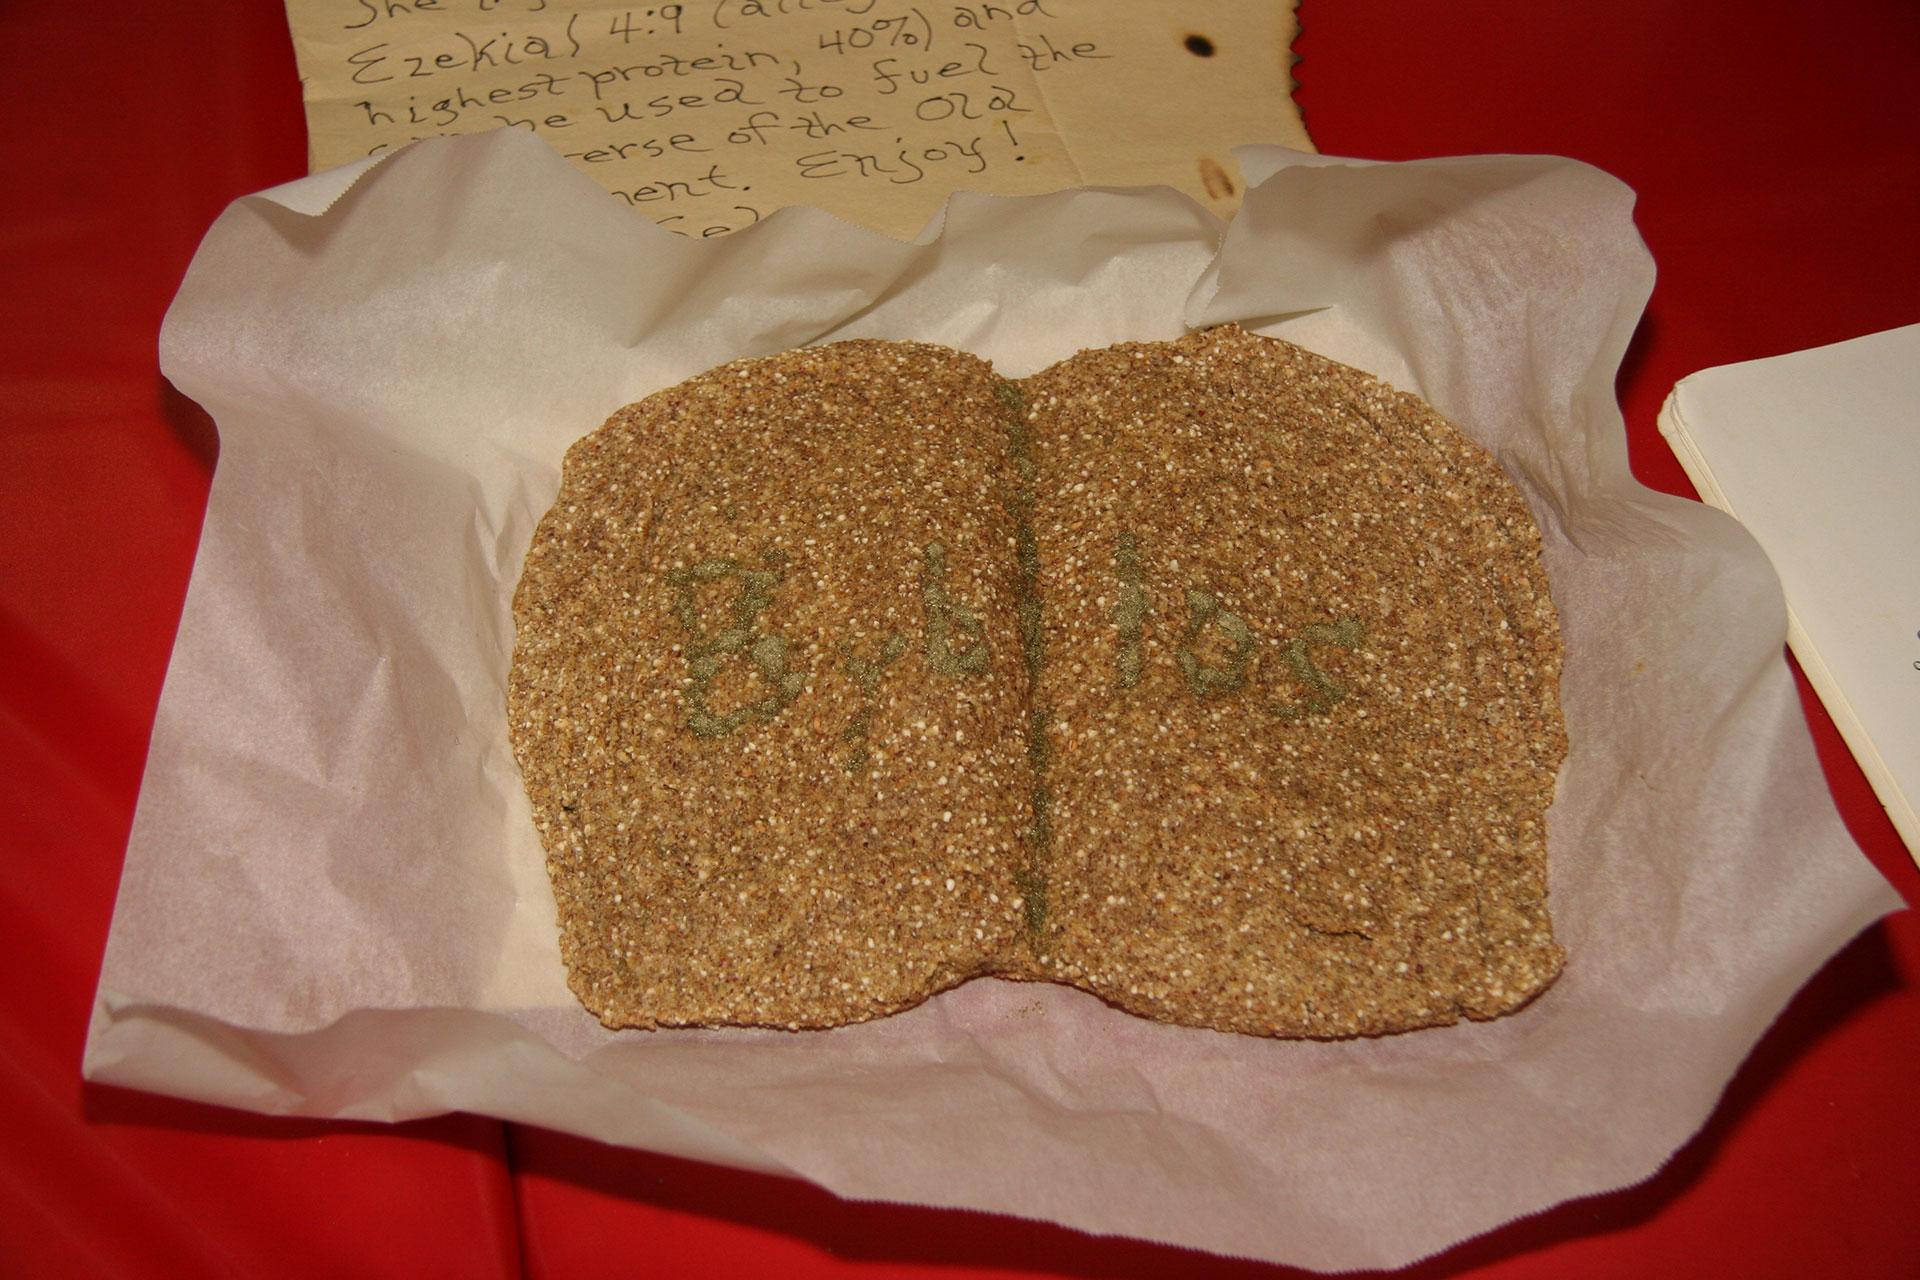 """The Book of Byblos (a.k.a. Bible)"" created by Dennis Flatt; 2011 KBAC Edible Book entry"